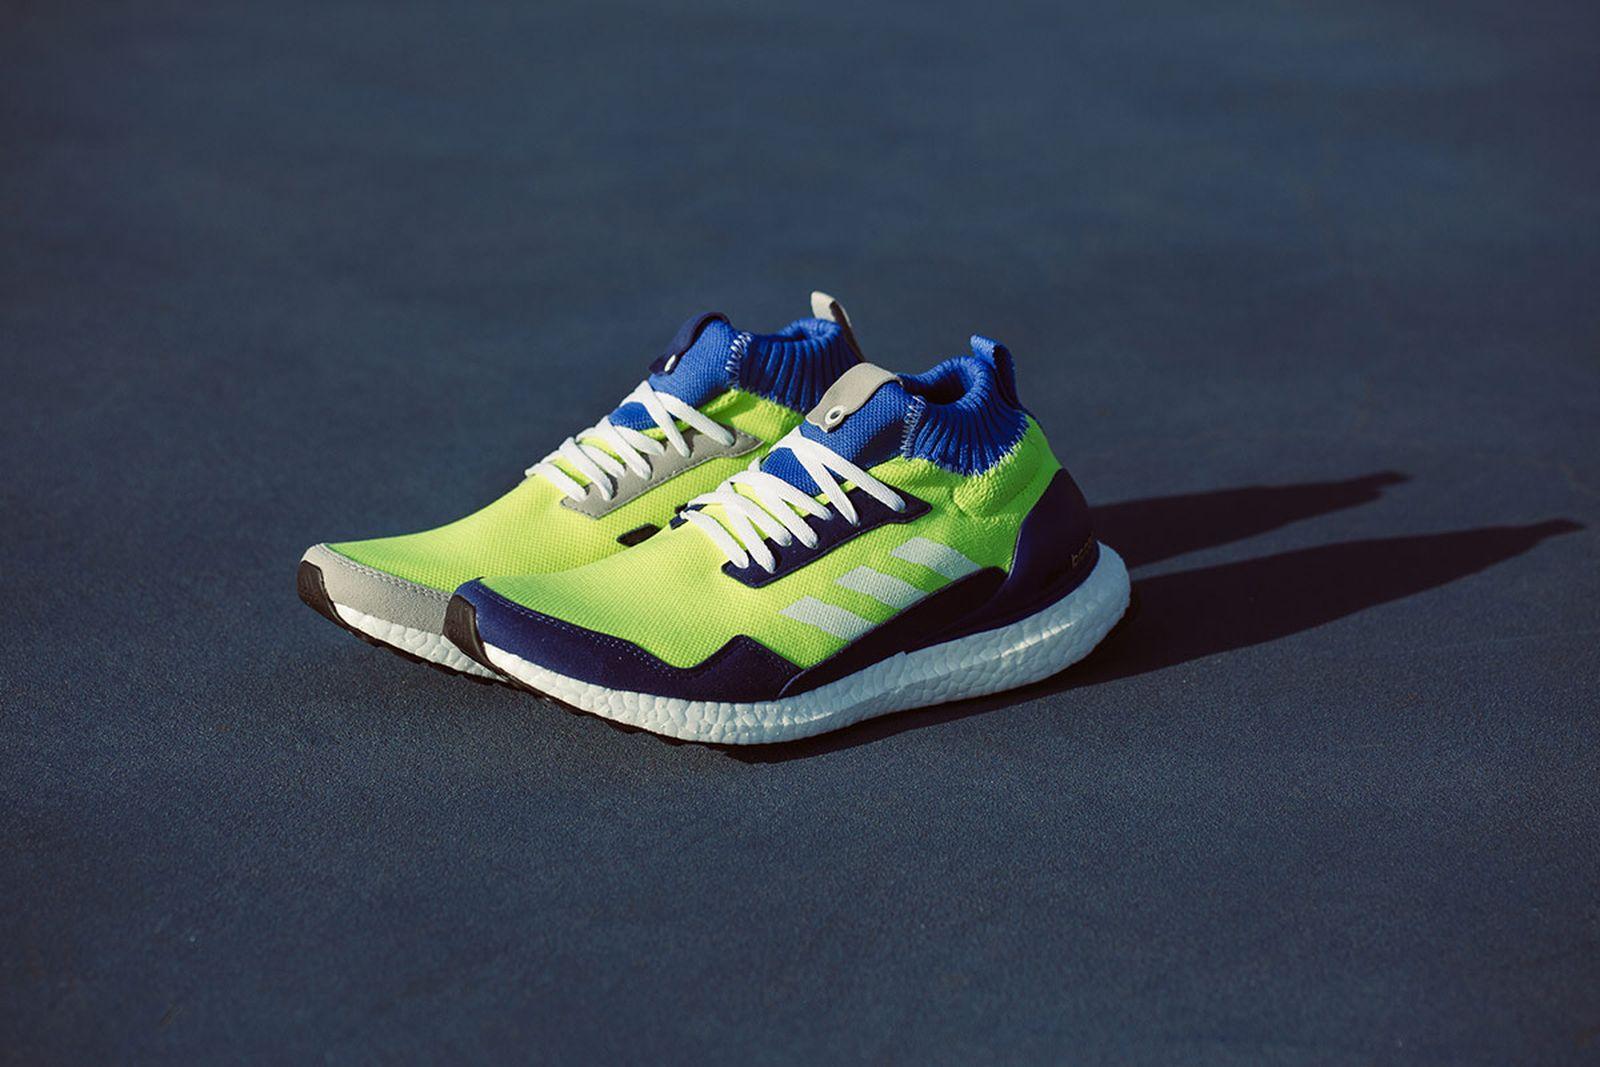 adidas-consortium-ultraboost-mid-prototype-release-date-price-02